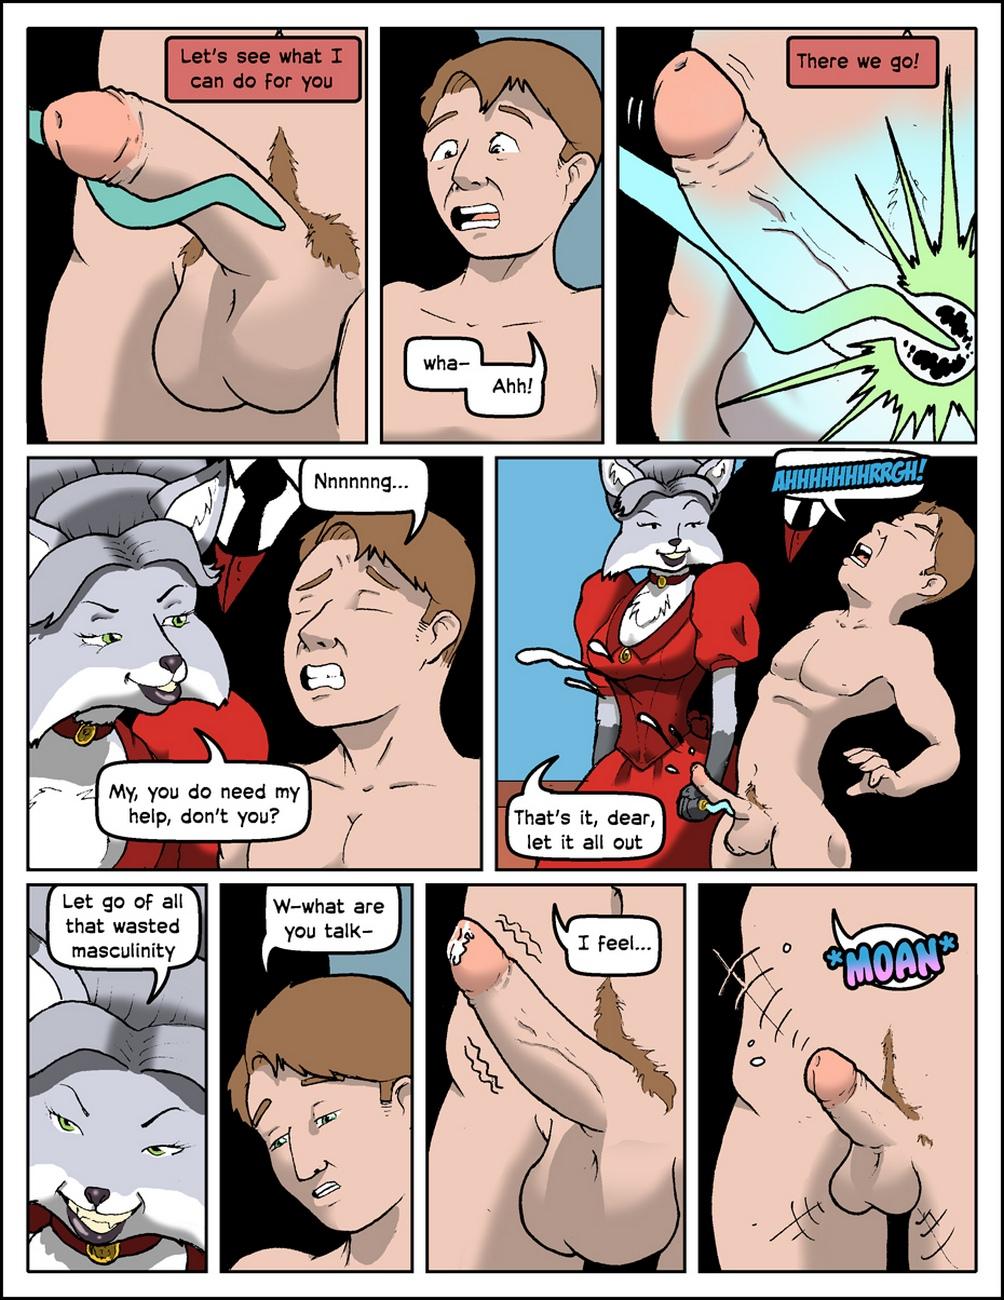 Bespoke-Companions 10 free sex comic